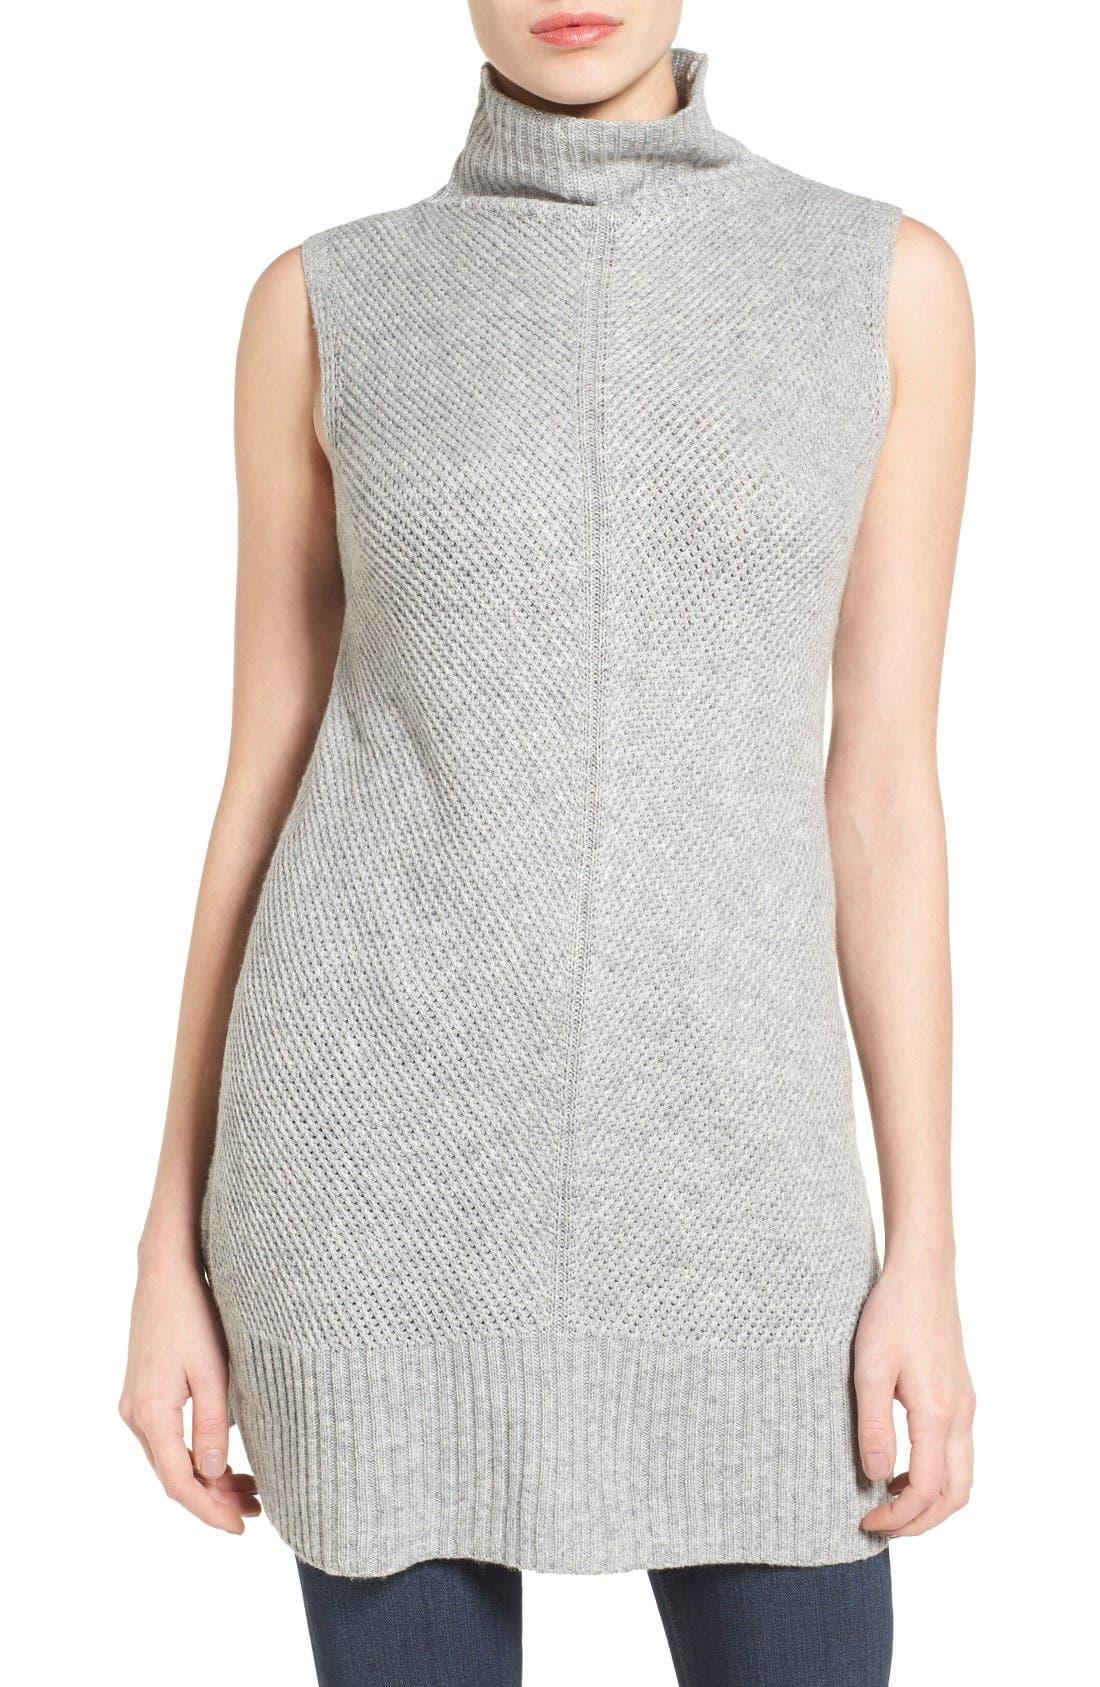 Main Image - Halogen® Sleeveless Tunic Sweater (Regular & Petite)